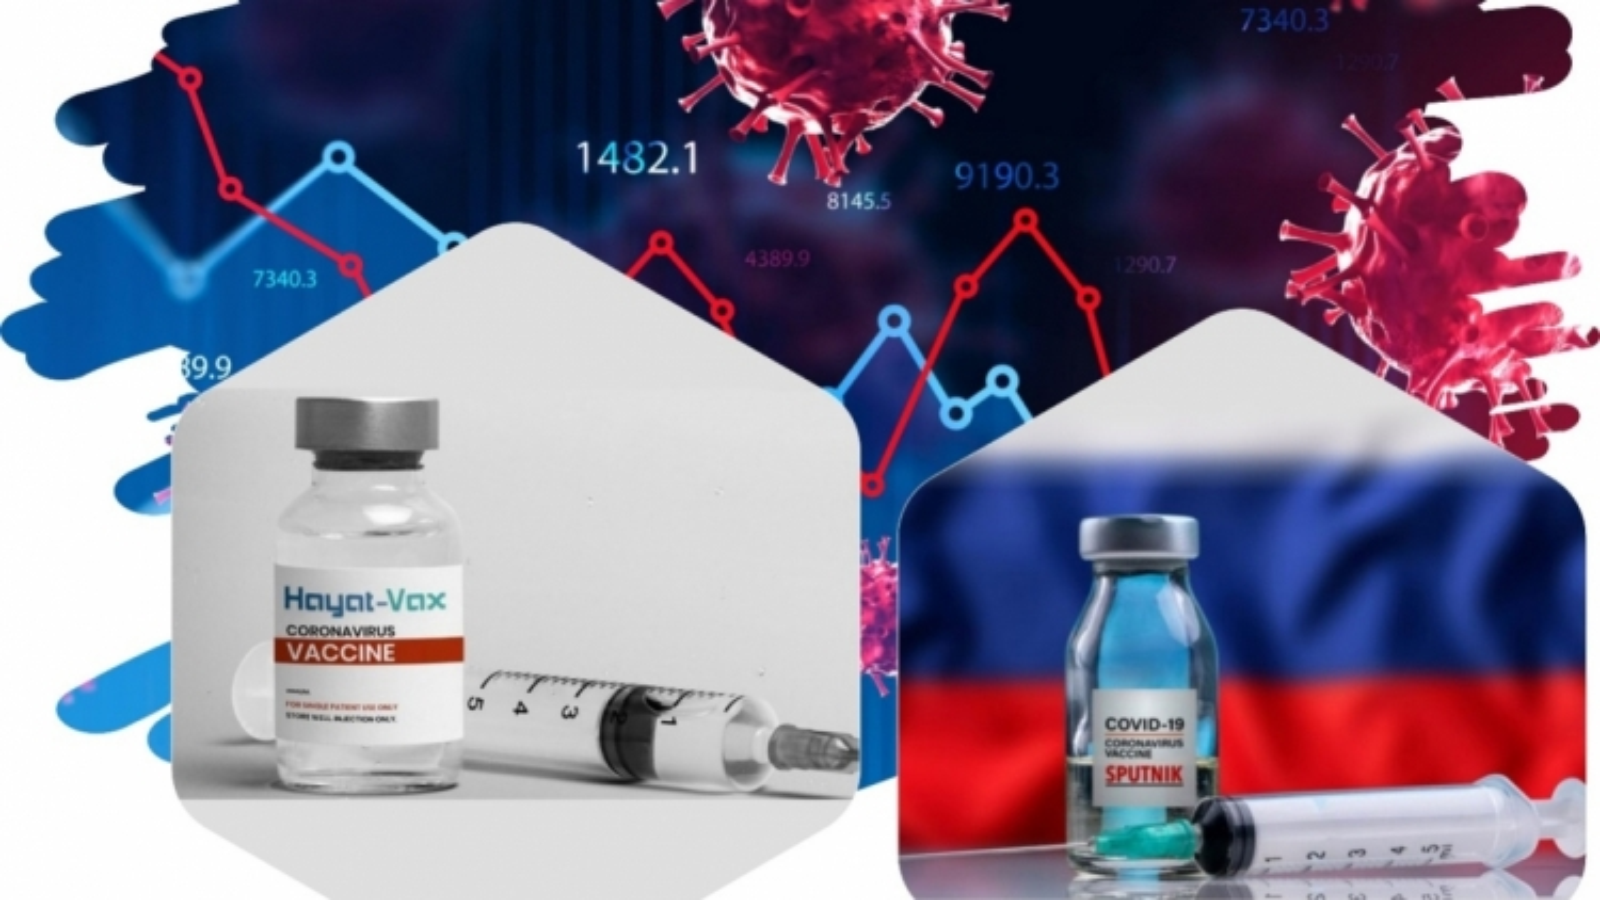 Vietnam likely to approve UAE-made Hayat-Vax vaccine